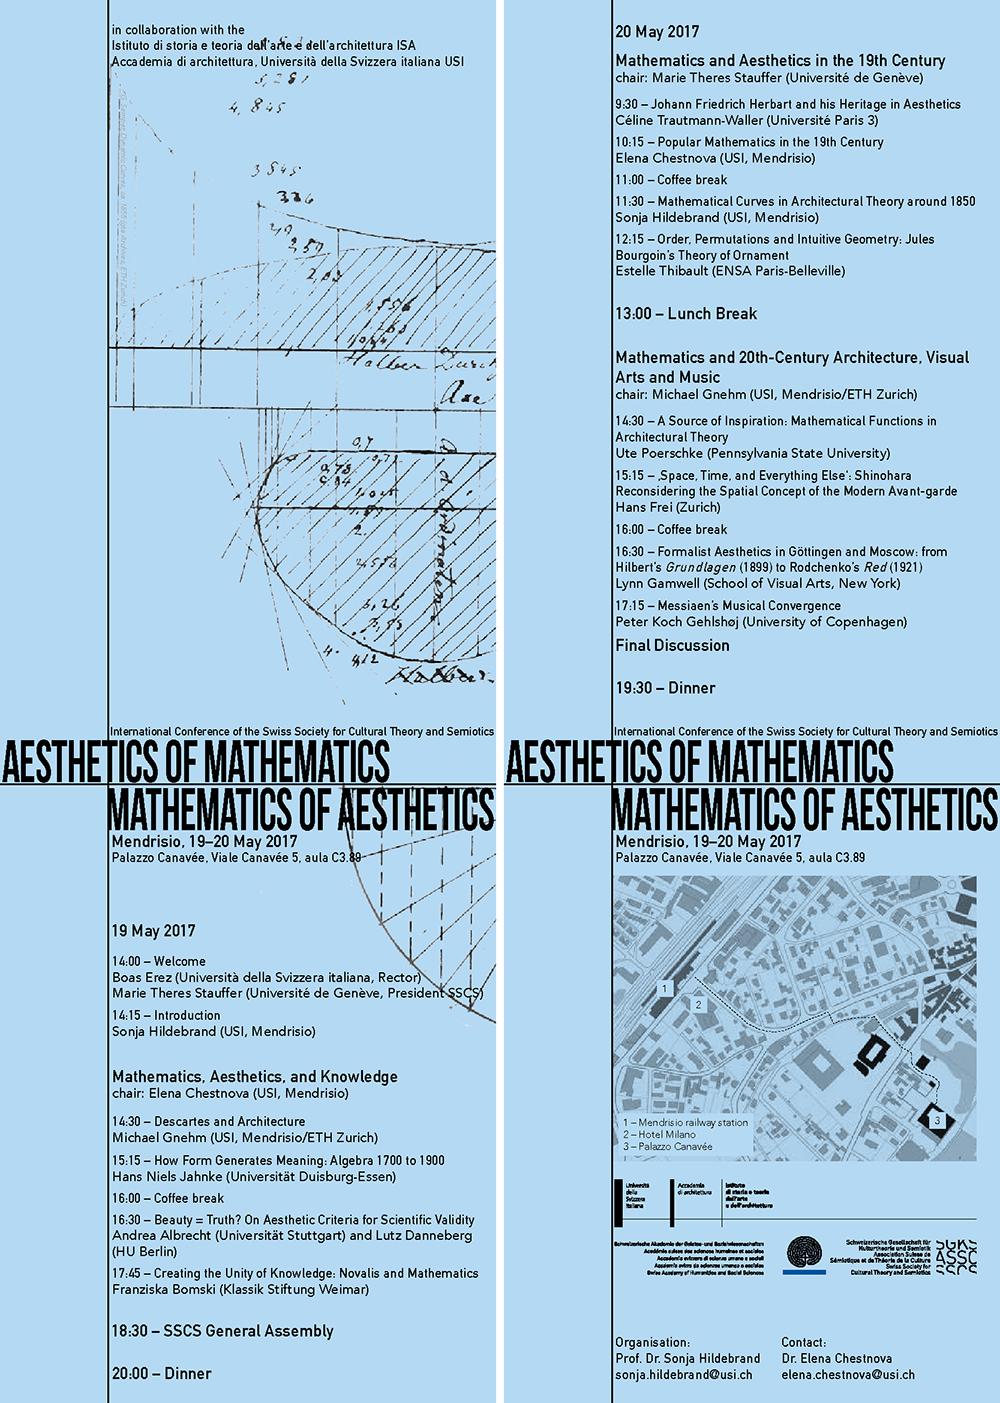 2017_Conference_Mendrisio_Aesthetics_of_Mathematics_flyer